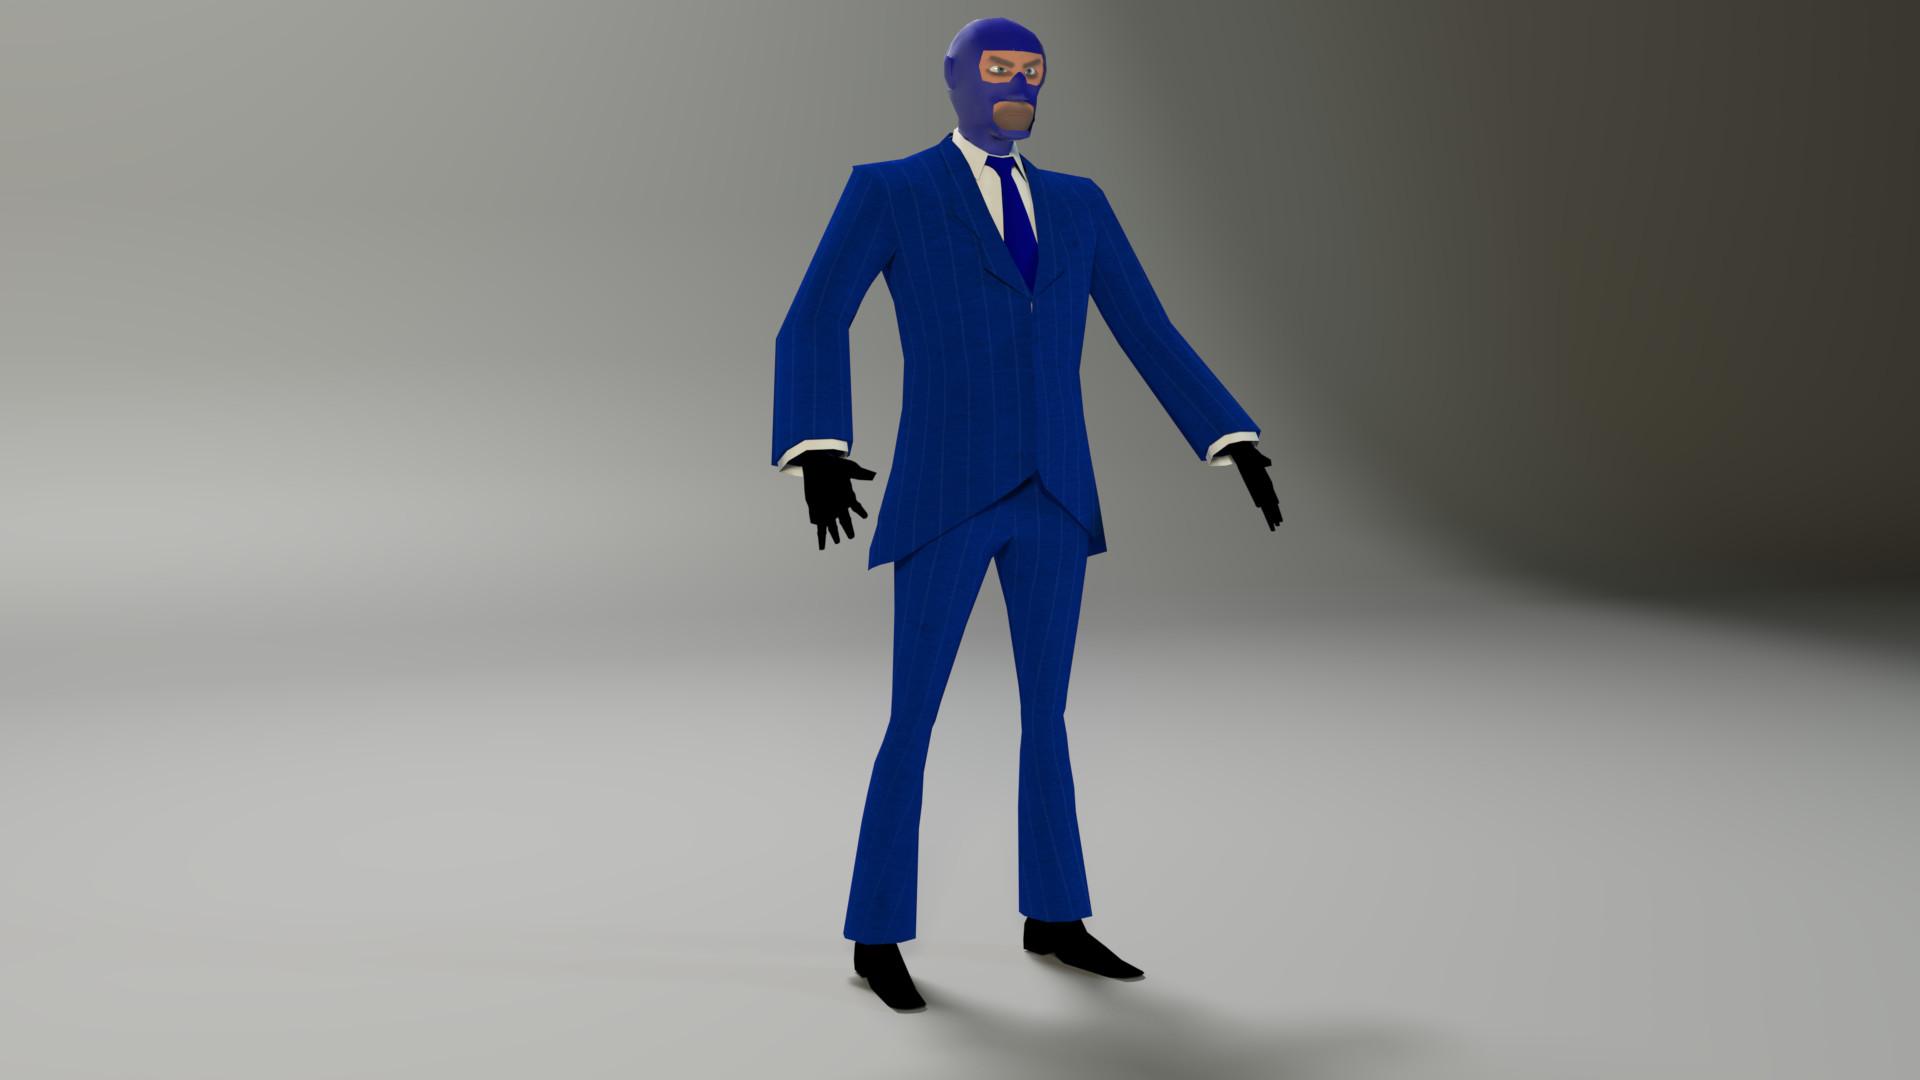 Artstation Team Fortress 2 Spy Low Poly Ben Scrivener